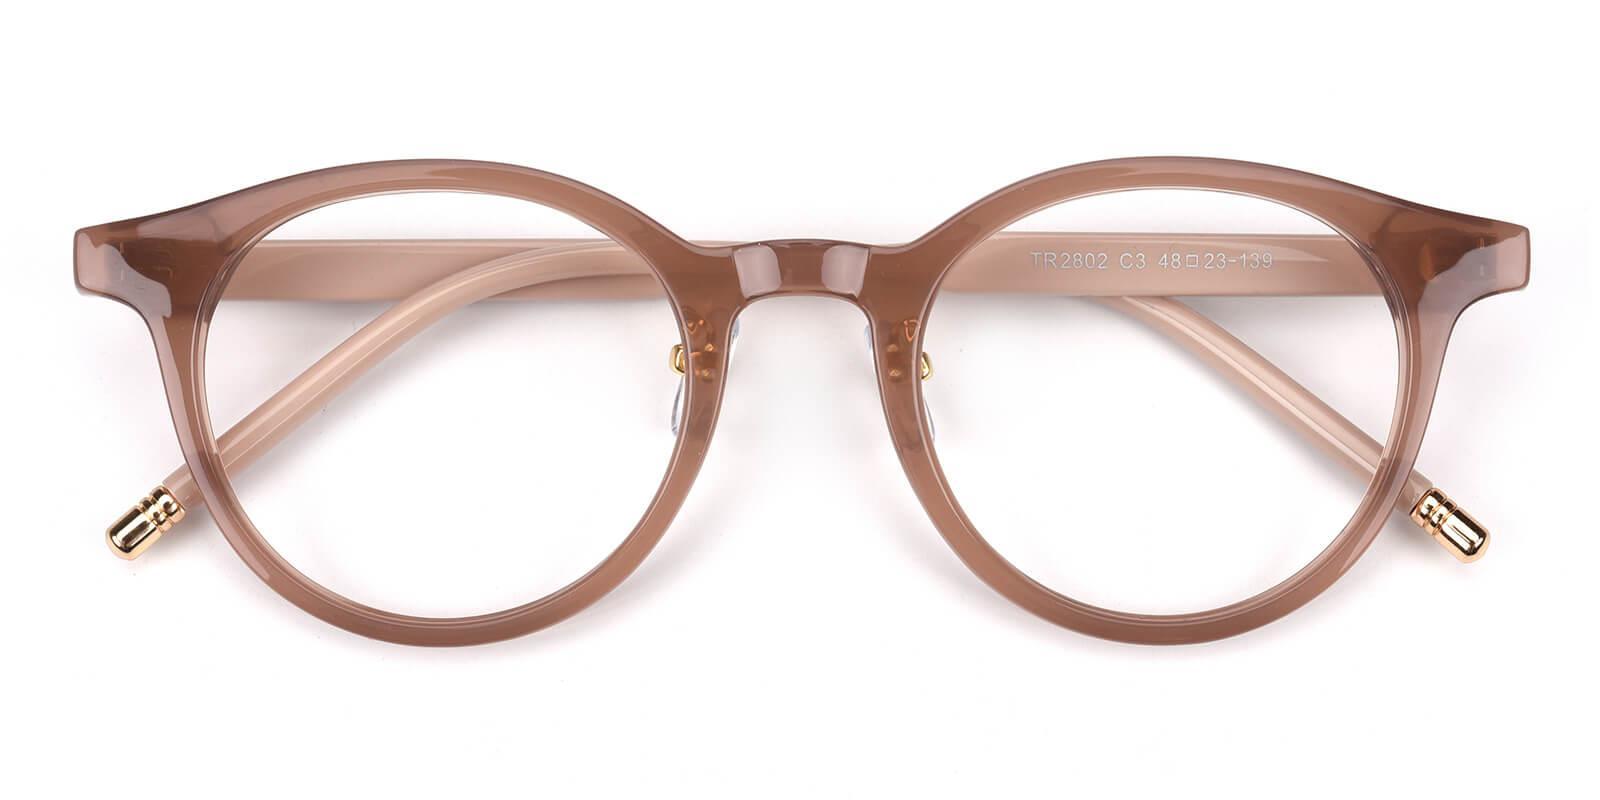 Kron-Multicolor-Round-TR-Eyeglasses-detail